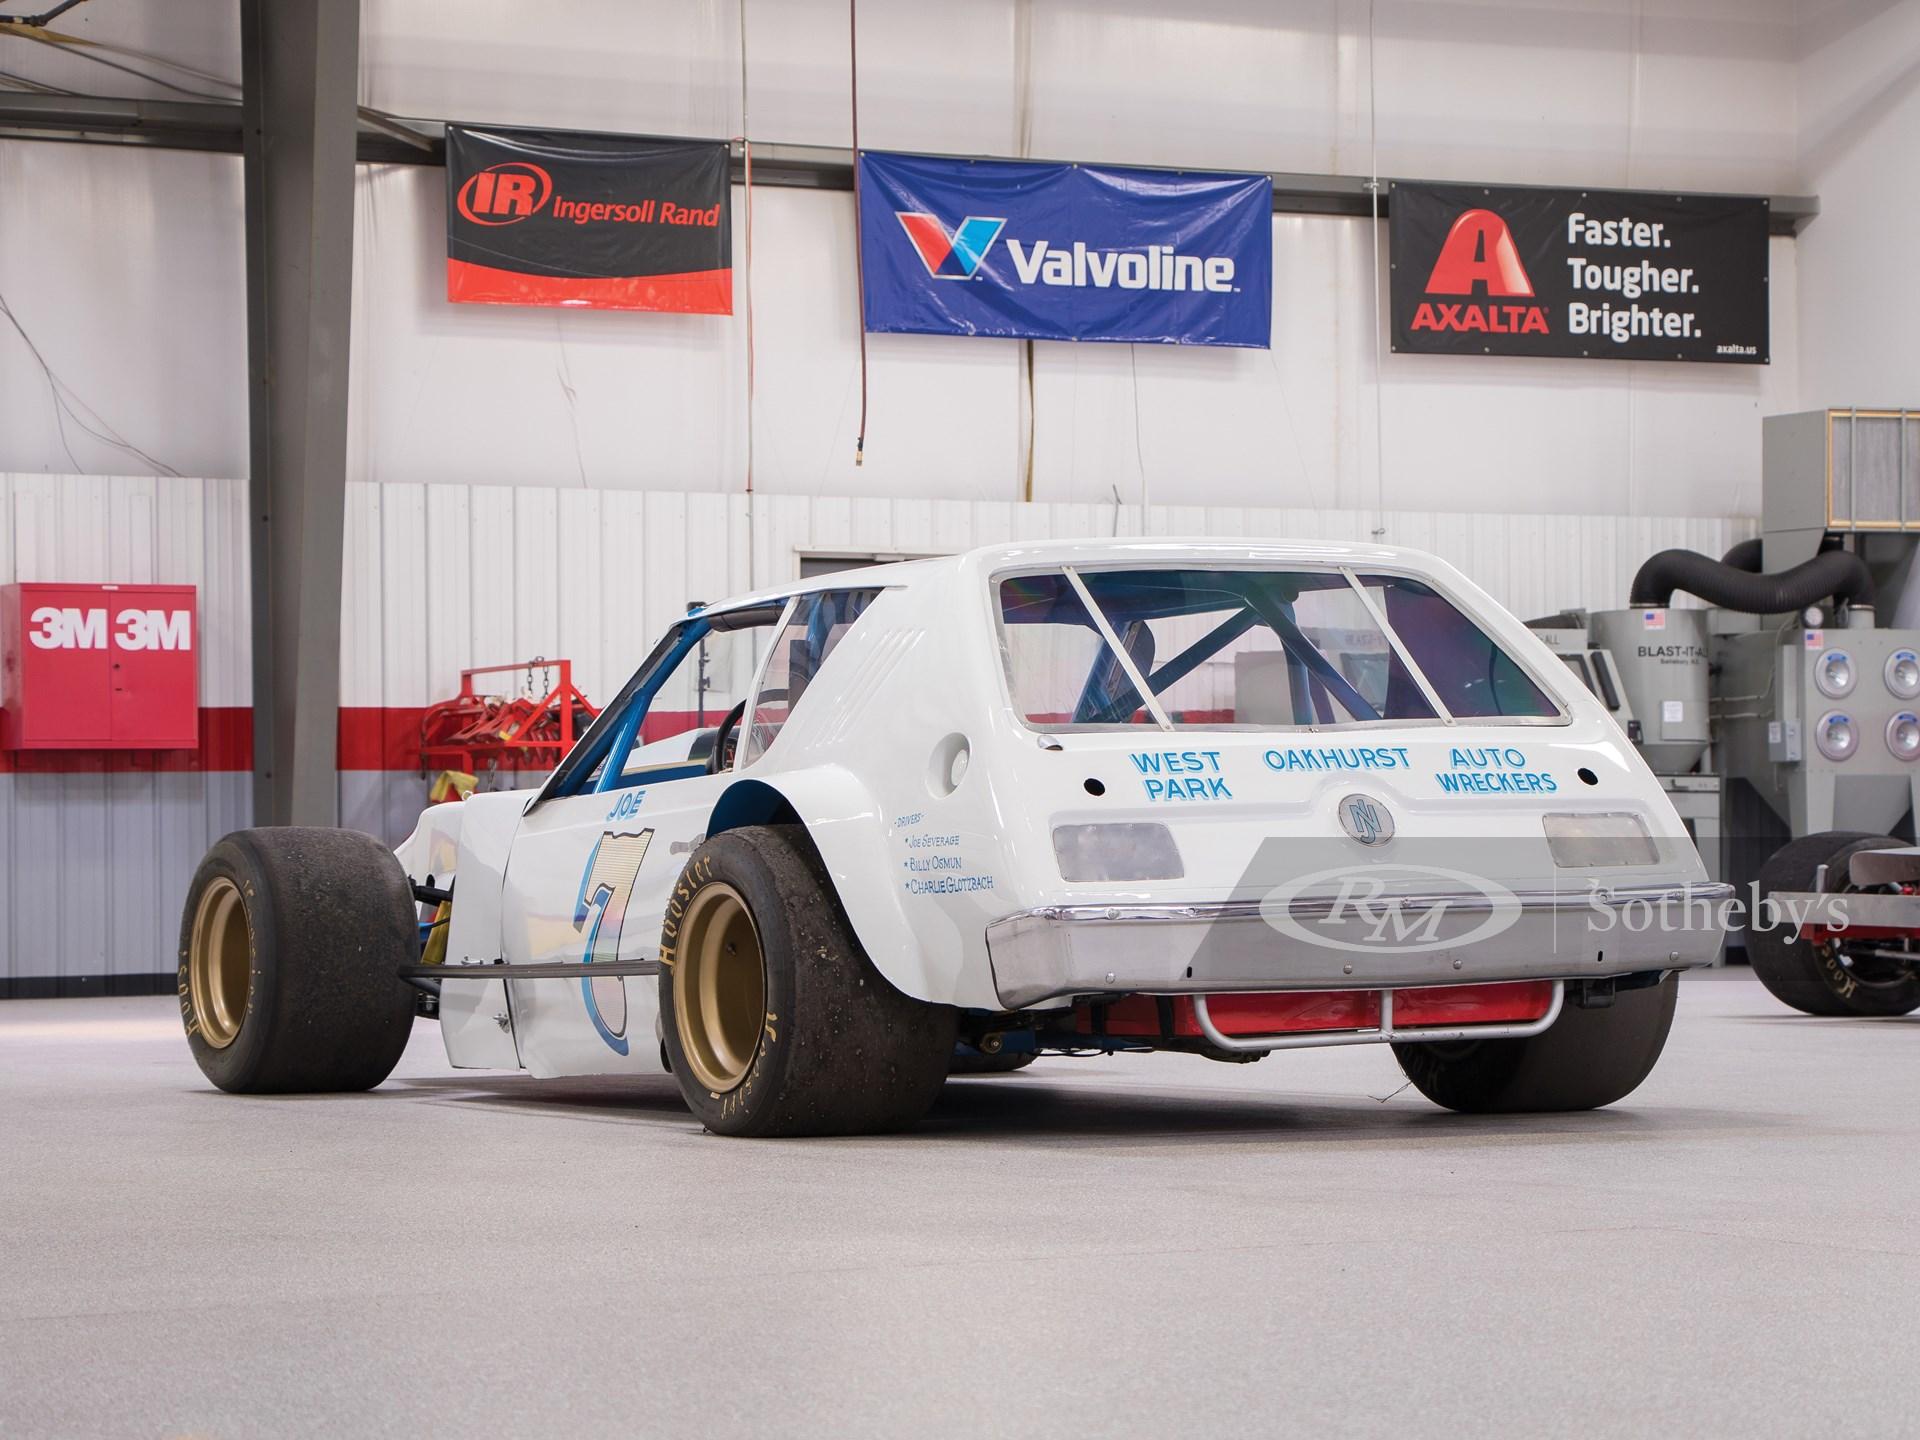 Ital Designs Hong Kong 1971 amc gremlin race car | auburn spring 2018 | rm auctions